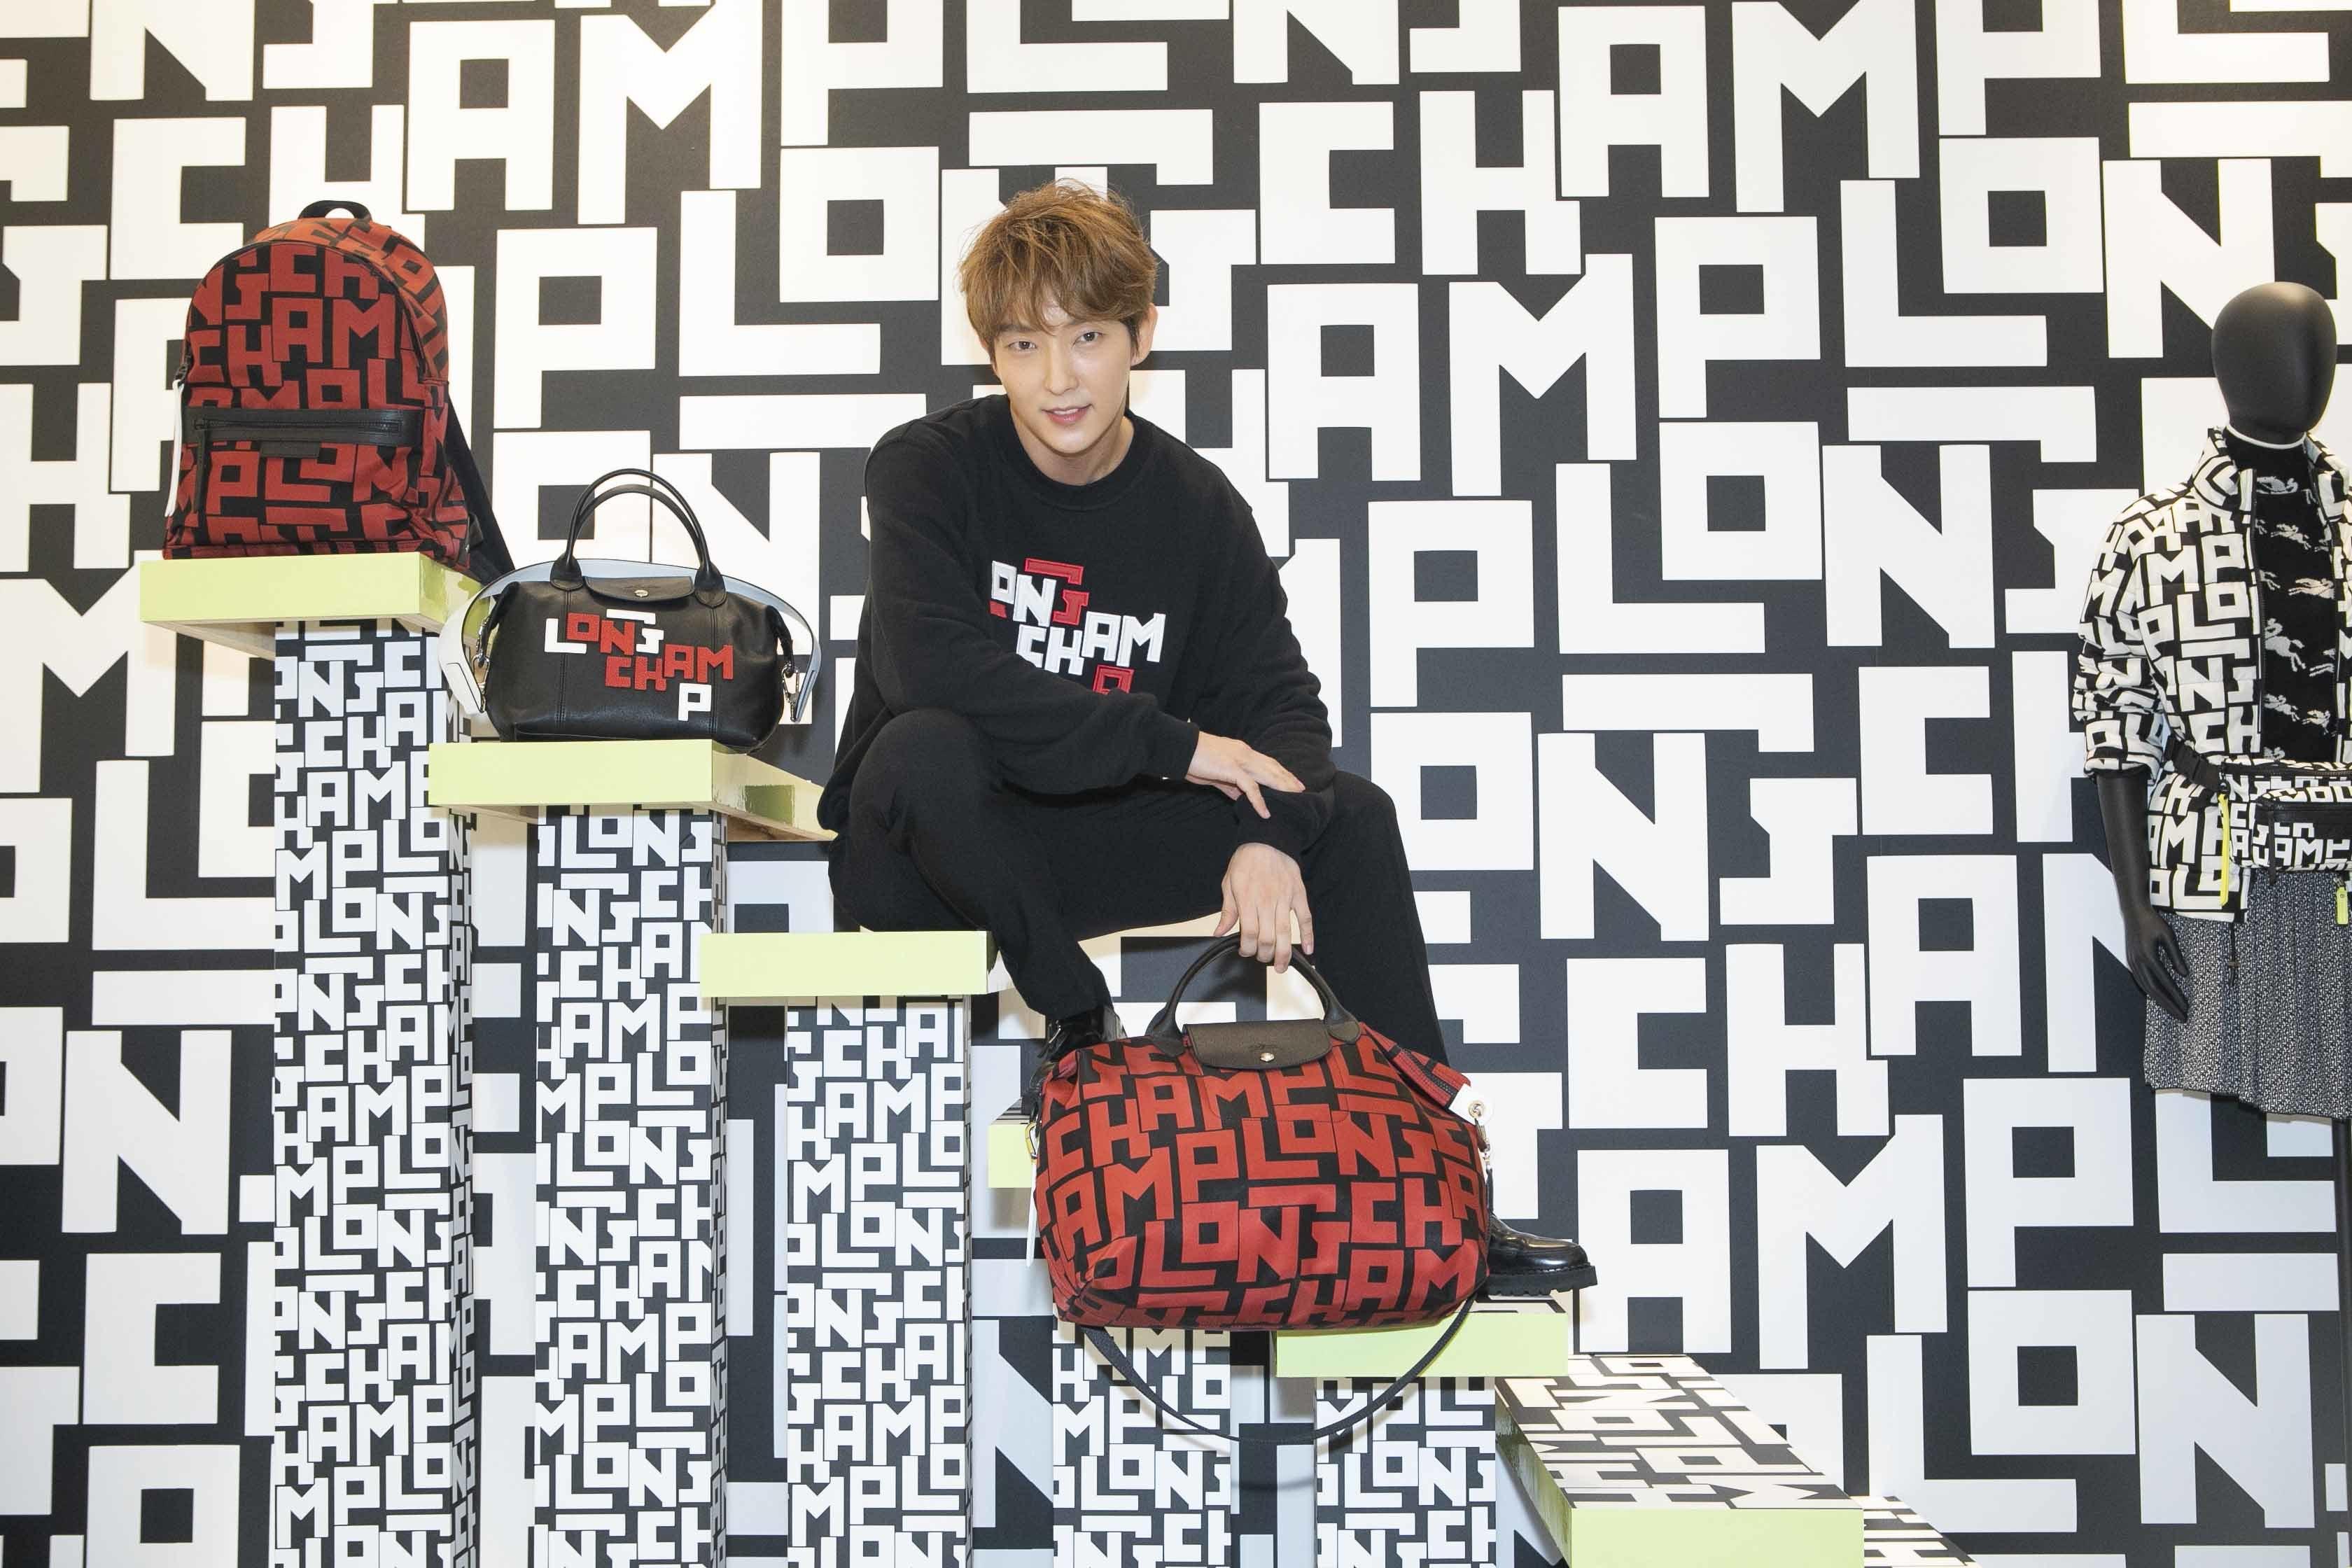 Longchamp 攜手「韓流巨星」李準基,三大重點演繹街潮型格!